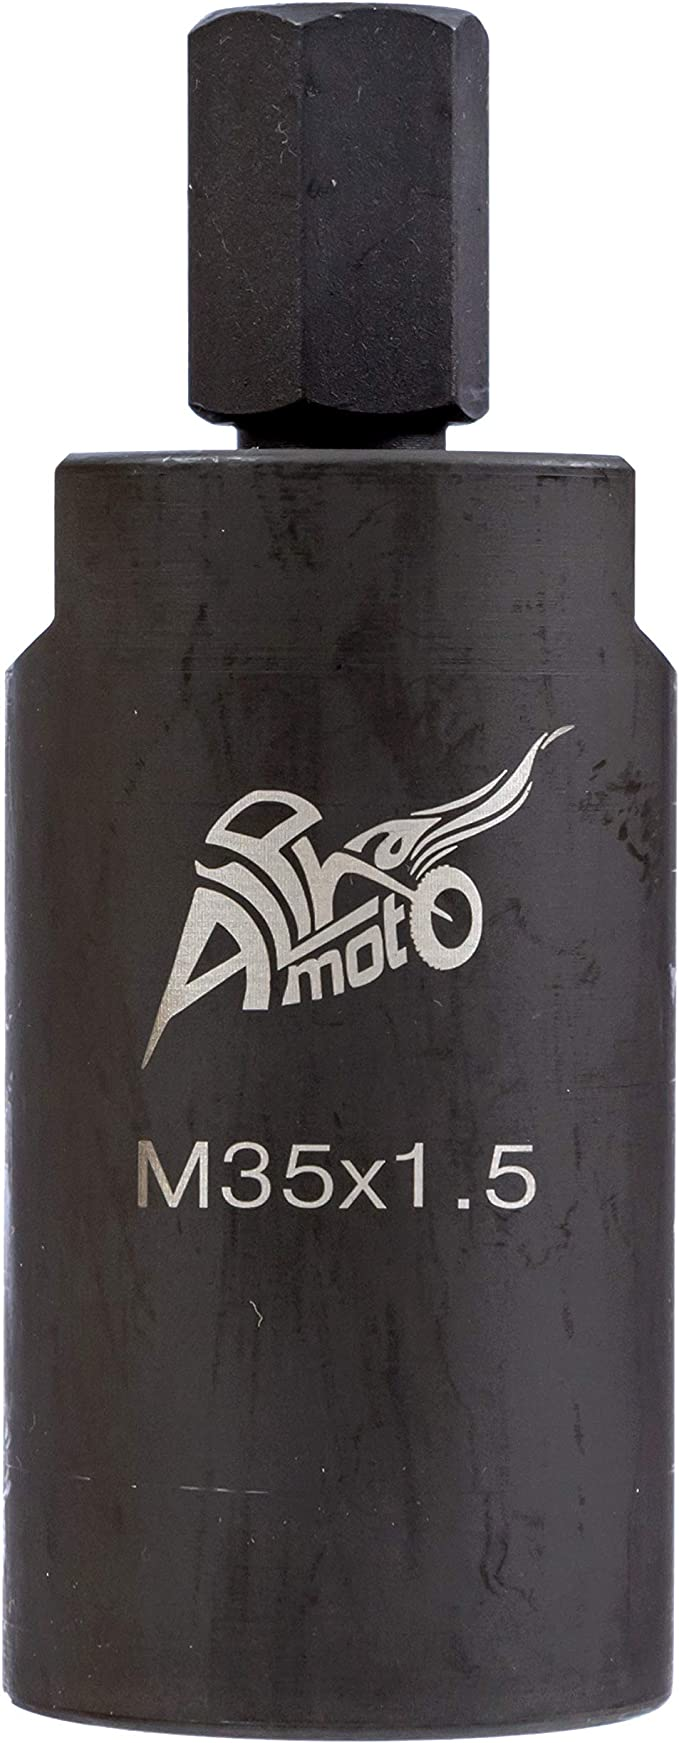 Flywheel Puller Yamaha Warrior YFM 350 400 660F 700R Quality USA Made